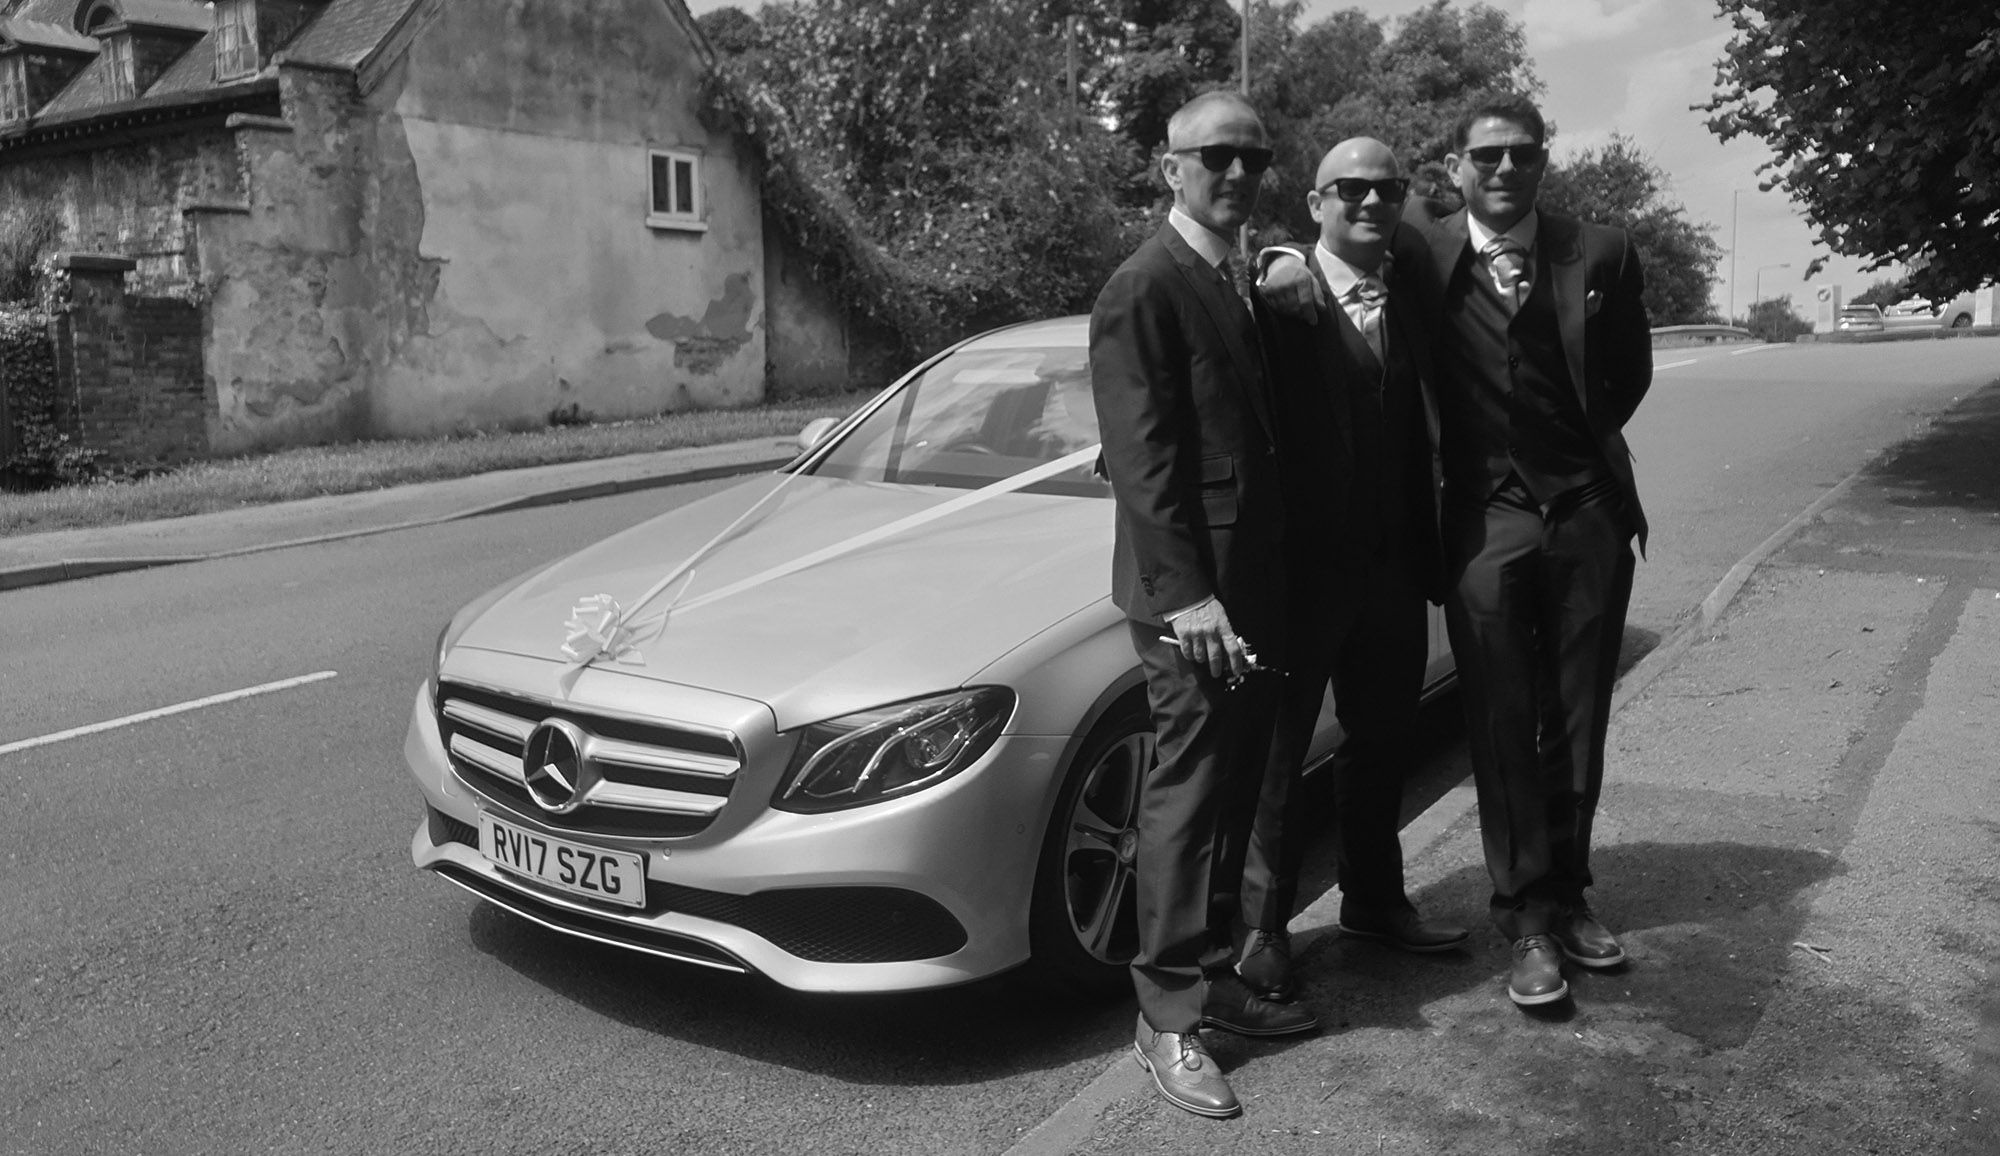 wedding entourage with their wedding car